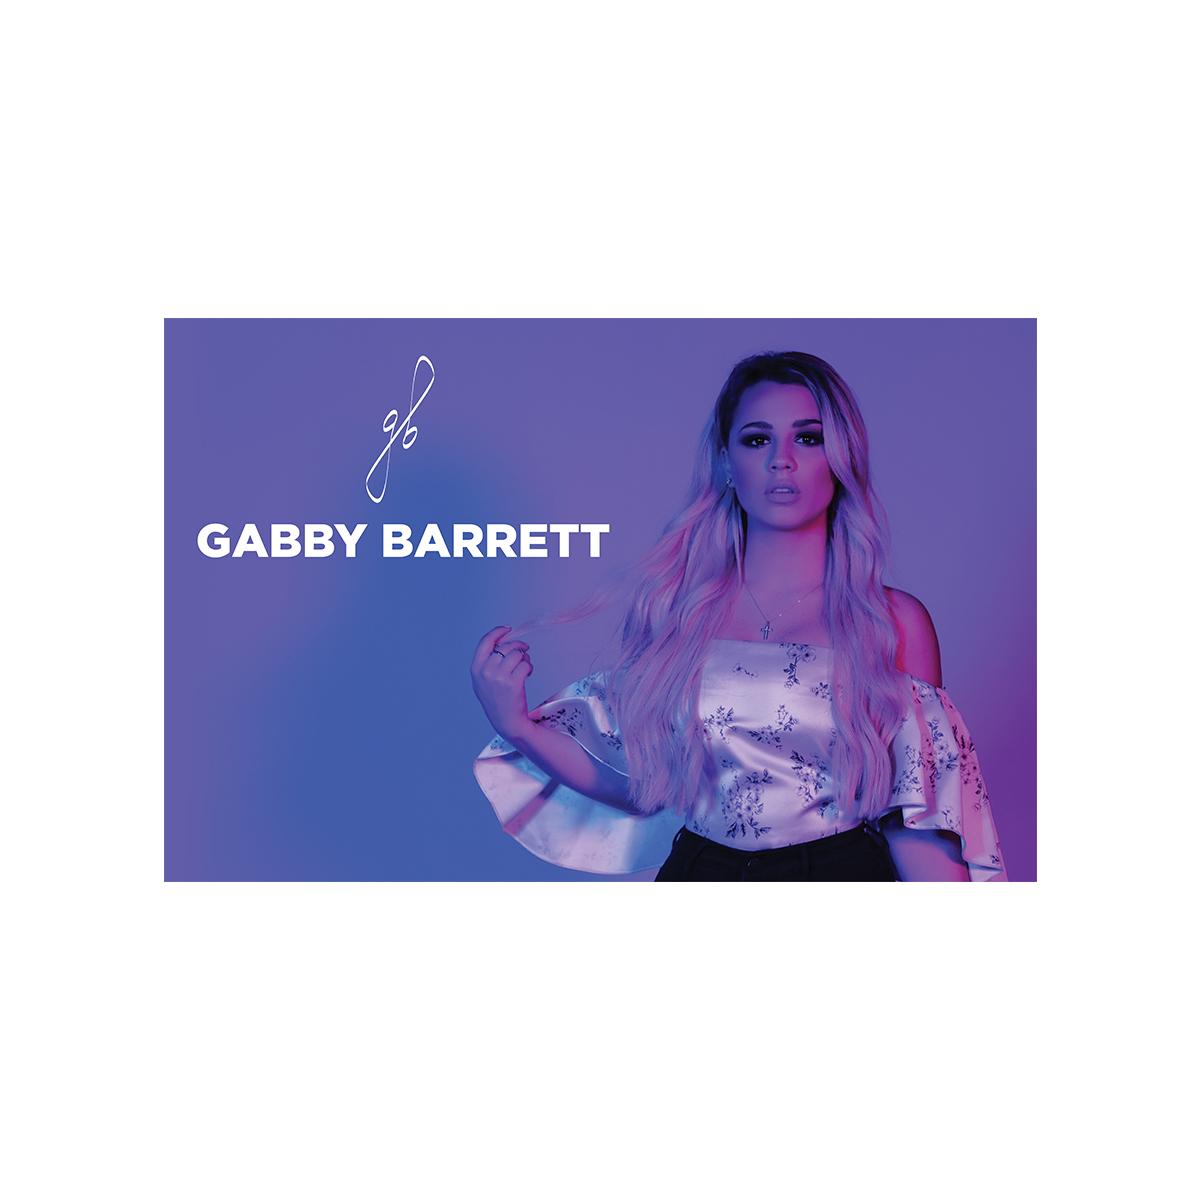 Gabby Barrett Photo Print